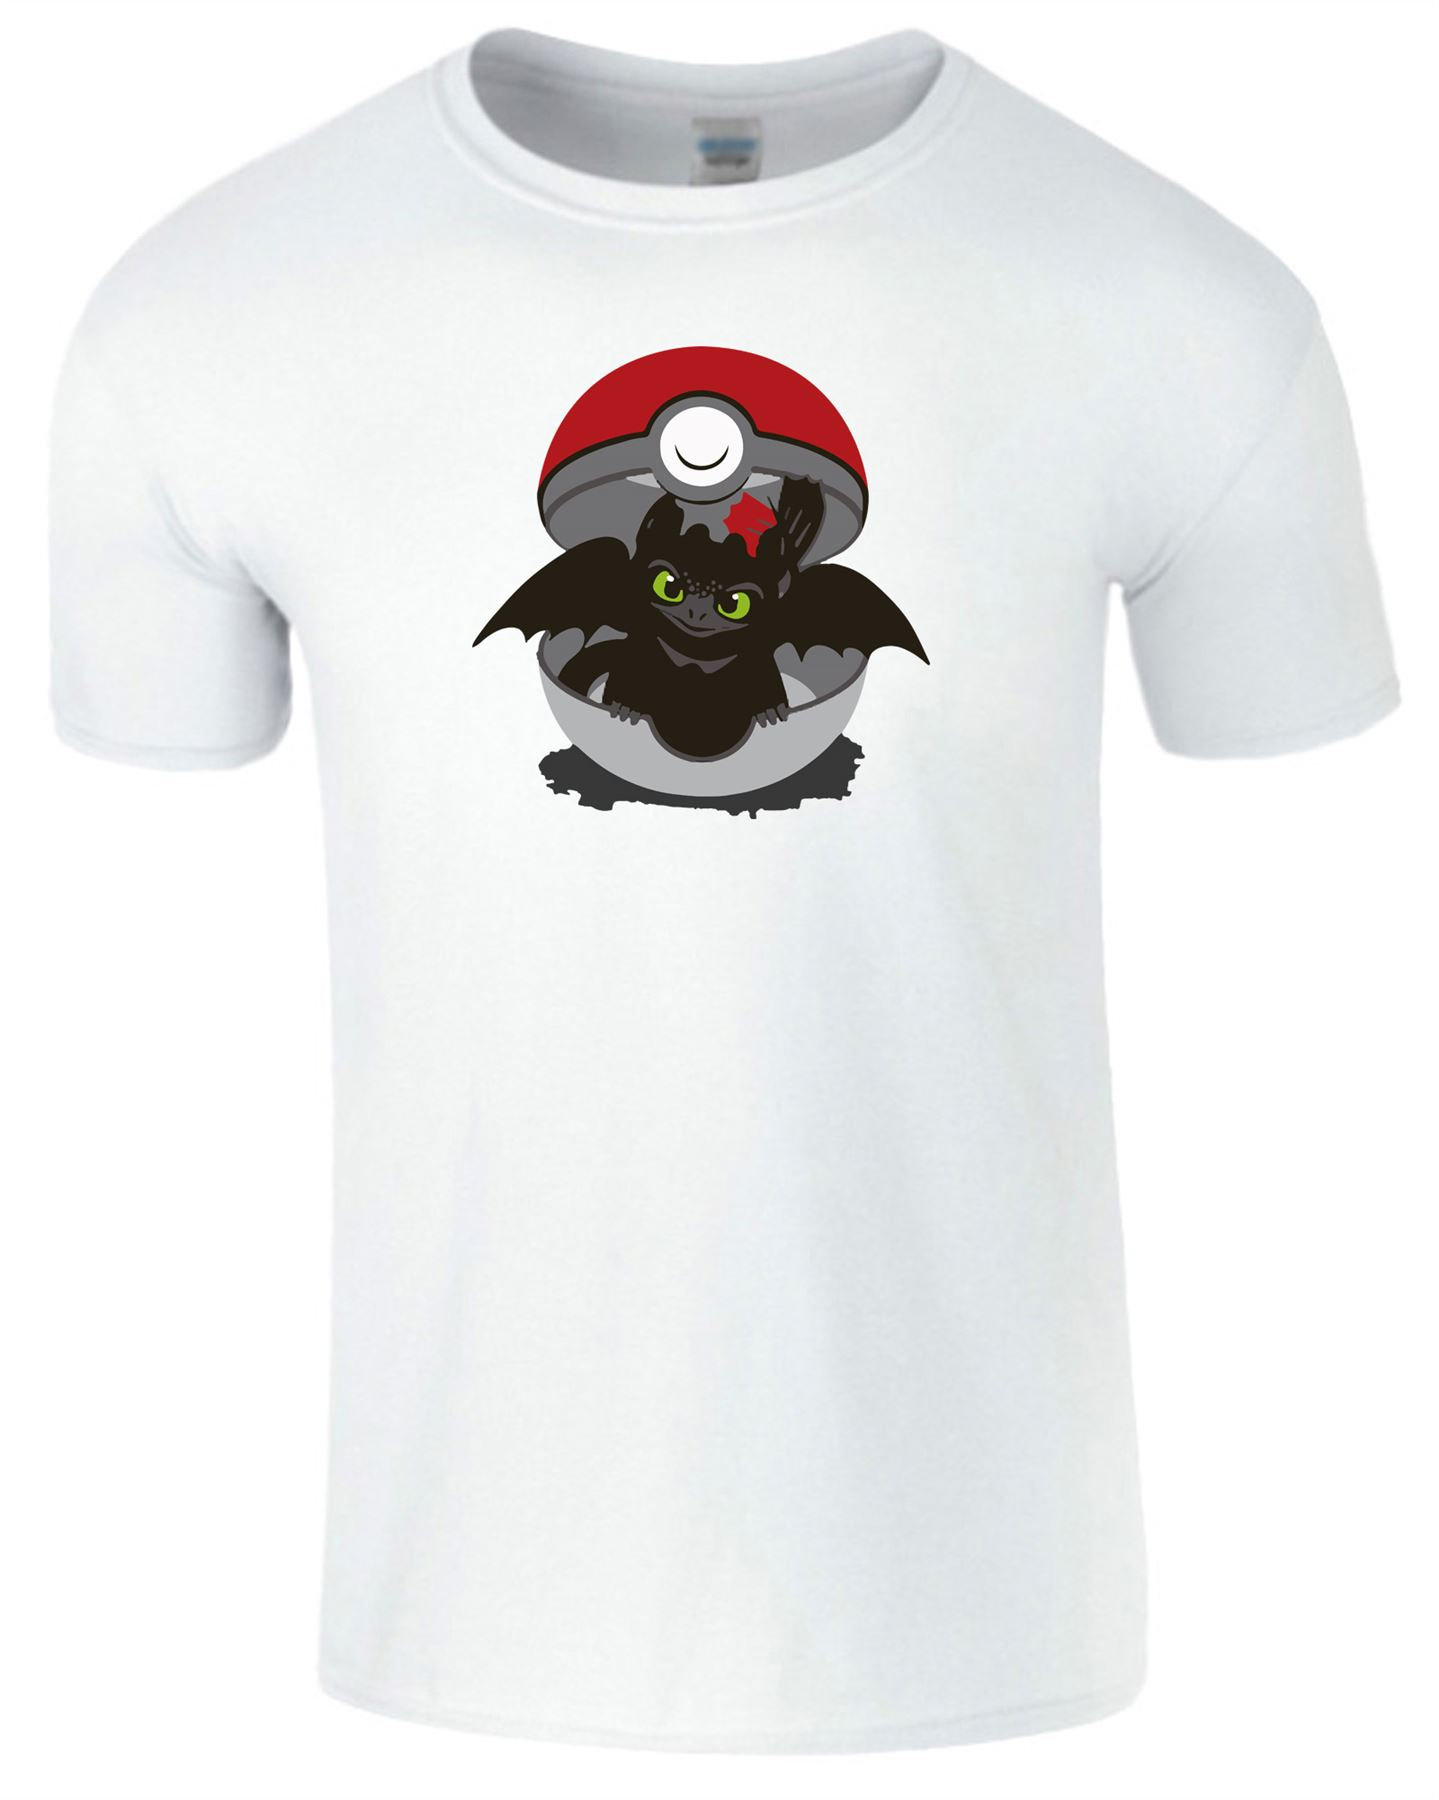 How-to-Train-Your-Dragon-Kids-T-shirt-inspire-edente-Pokemon-Haut-Fille-T-Shirt